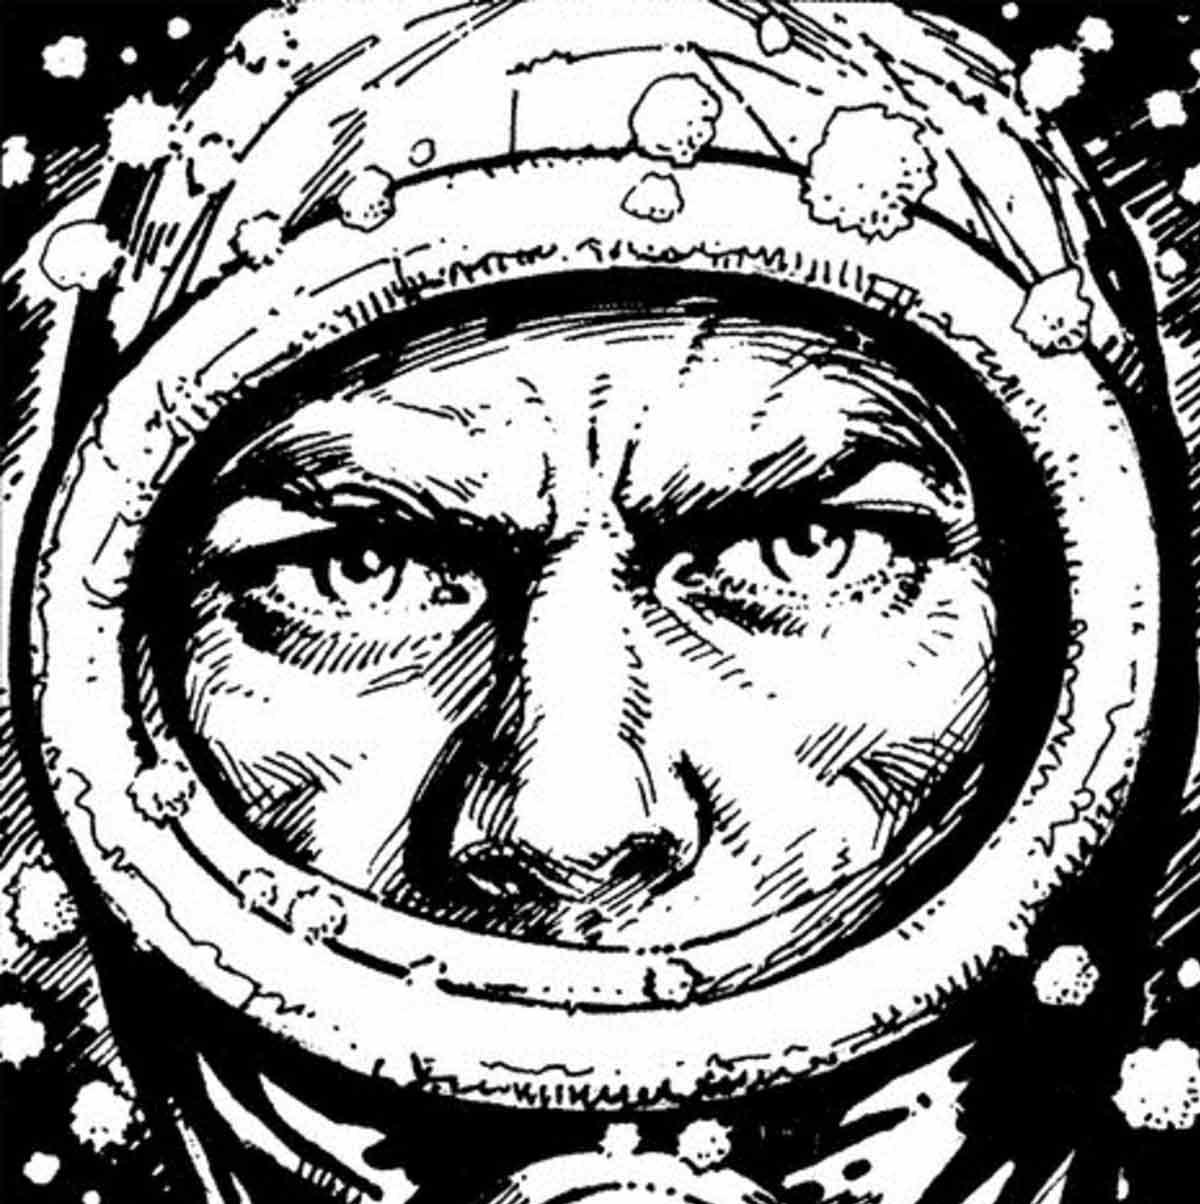 Golem-Comics-El-Eternauta-Solano-Lopez-Oesterheld-06